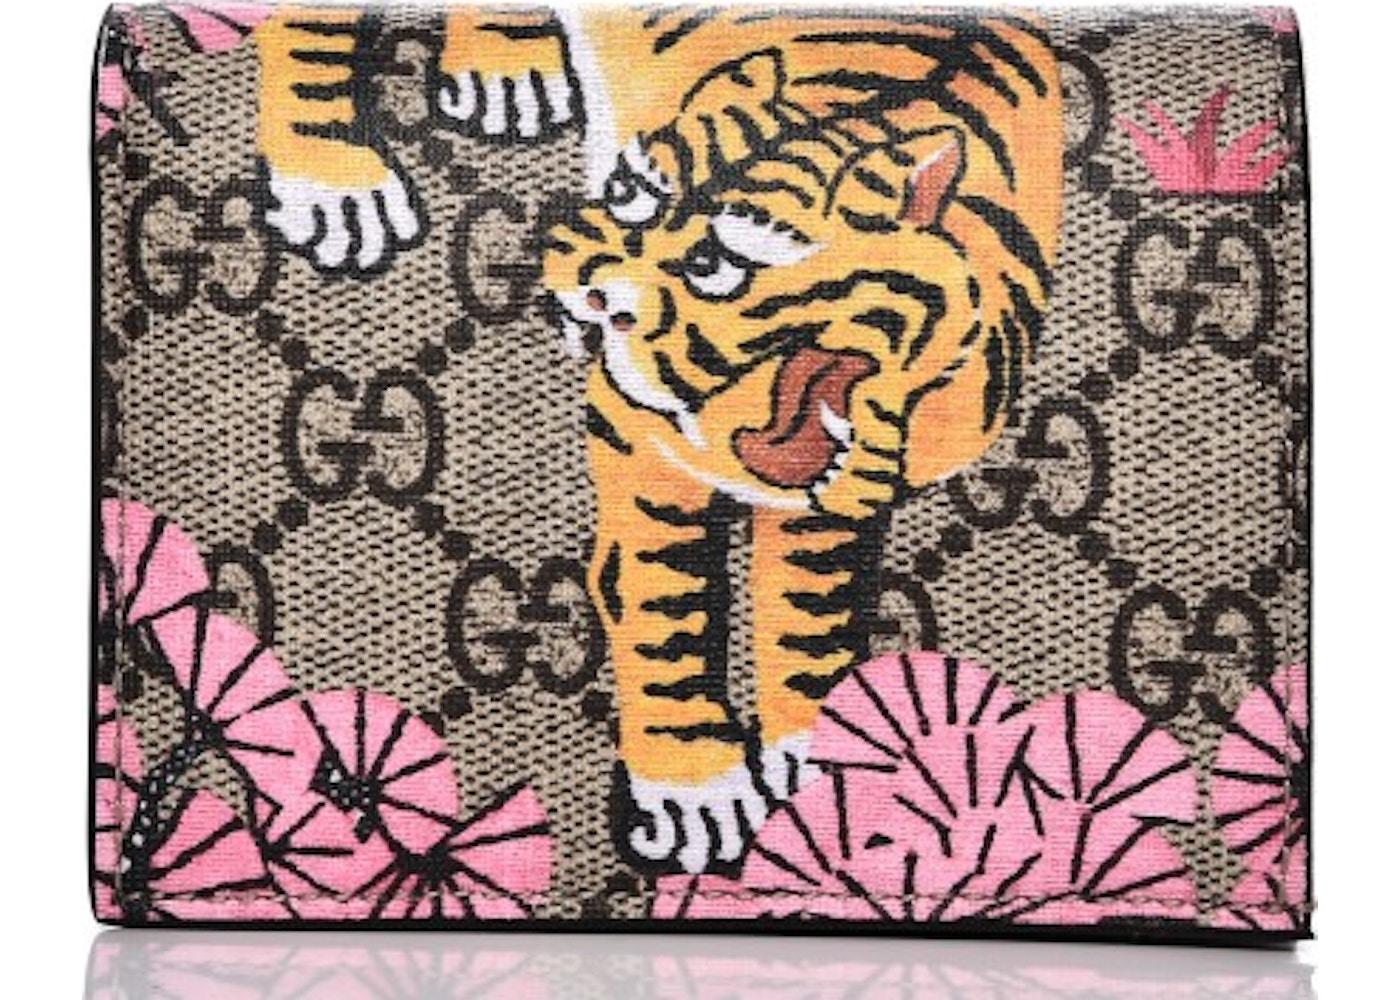 86329d2ae2a Gucci Card Case Wallet Monogram GG Bengal Print Black Beige ...